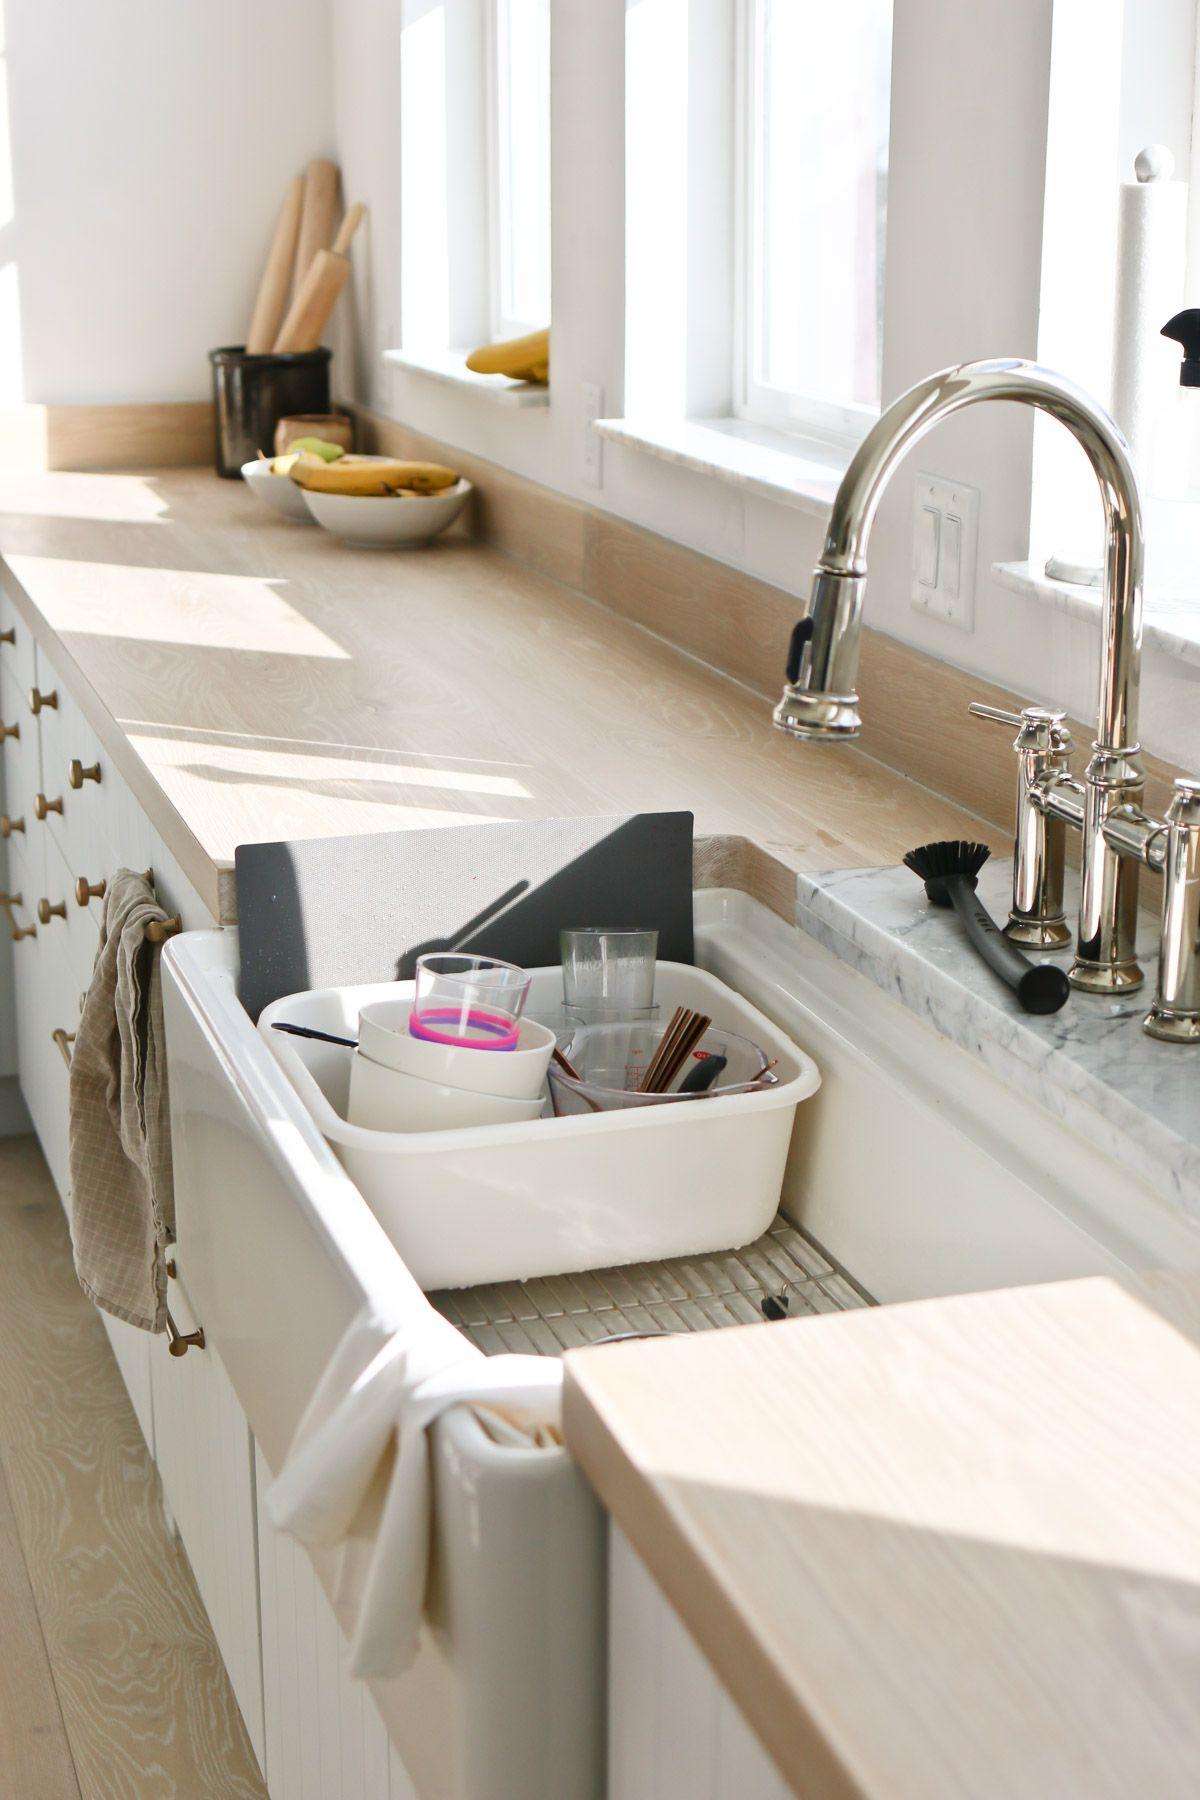 5 Reasons I Love My Large Single Basin Sink Basin Sink Sink